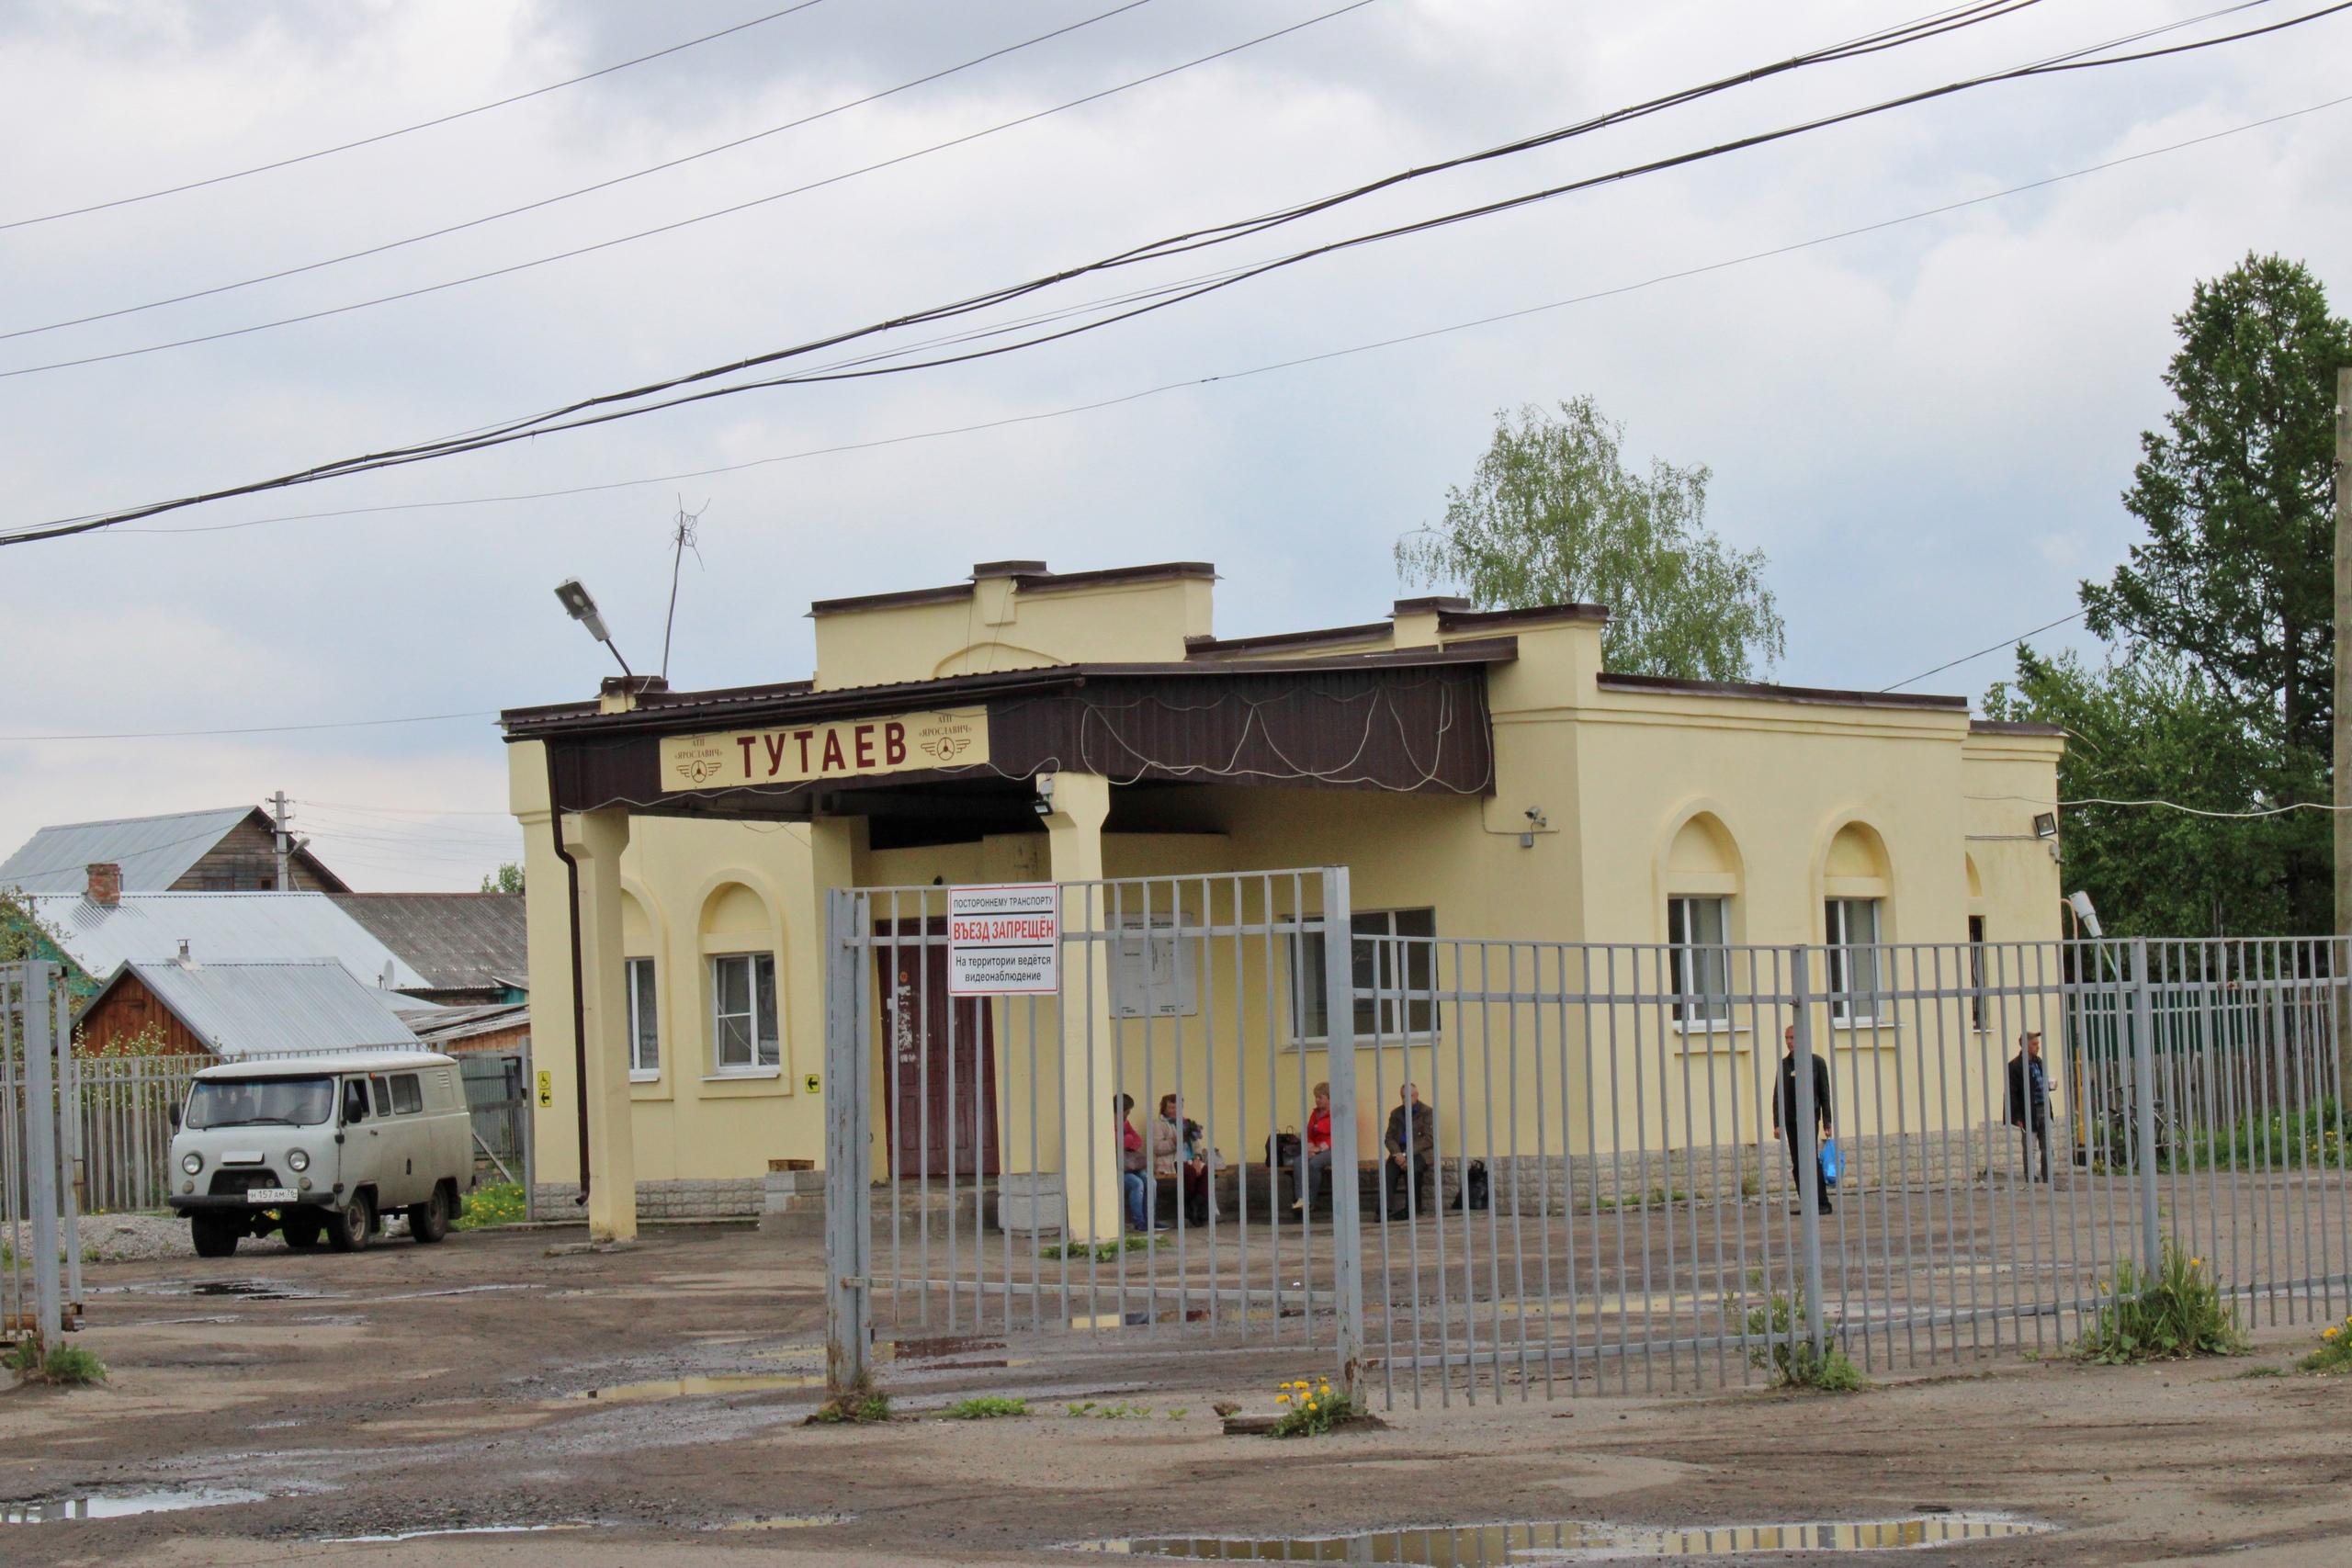 Автостанция Тутаев (лев./б.)